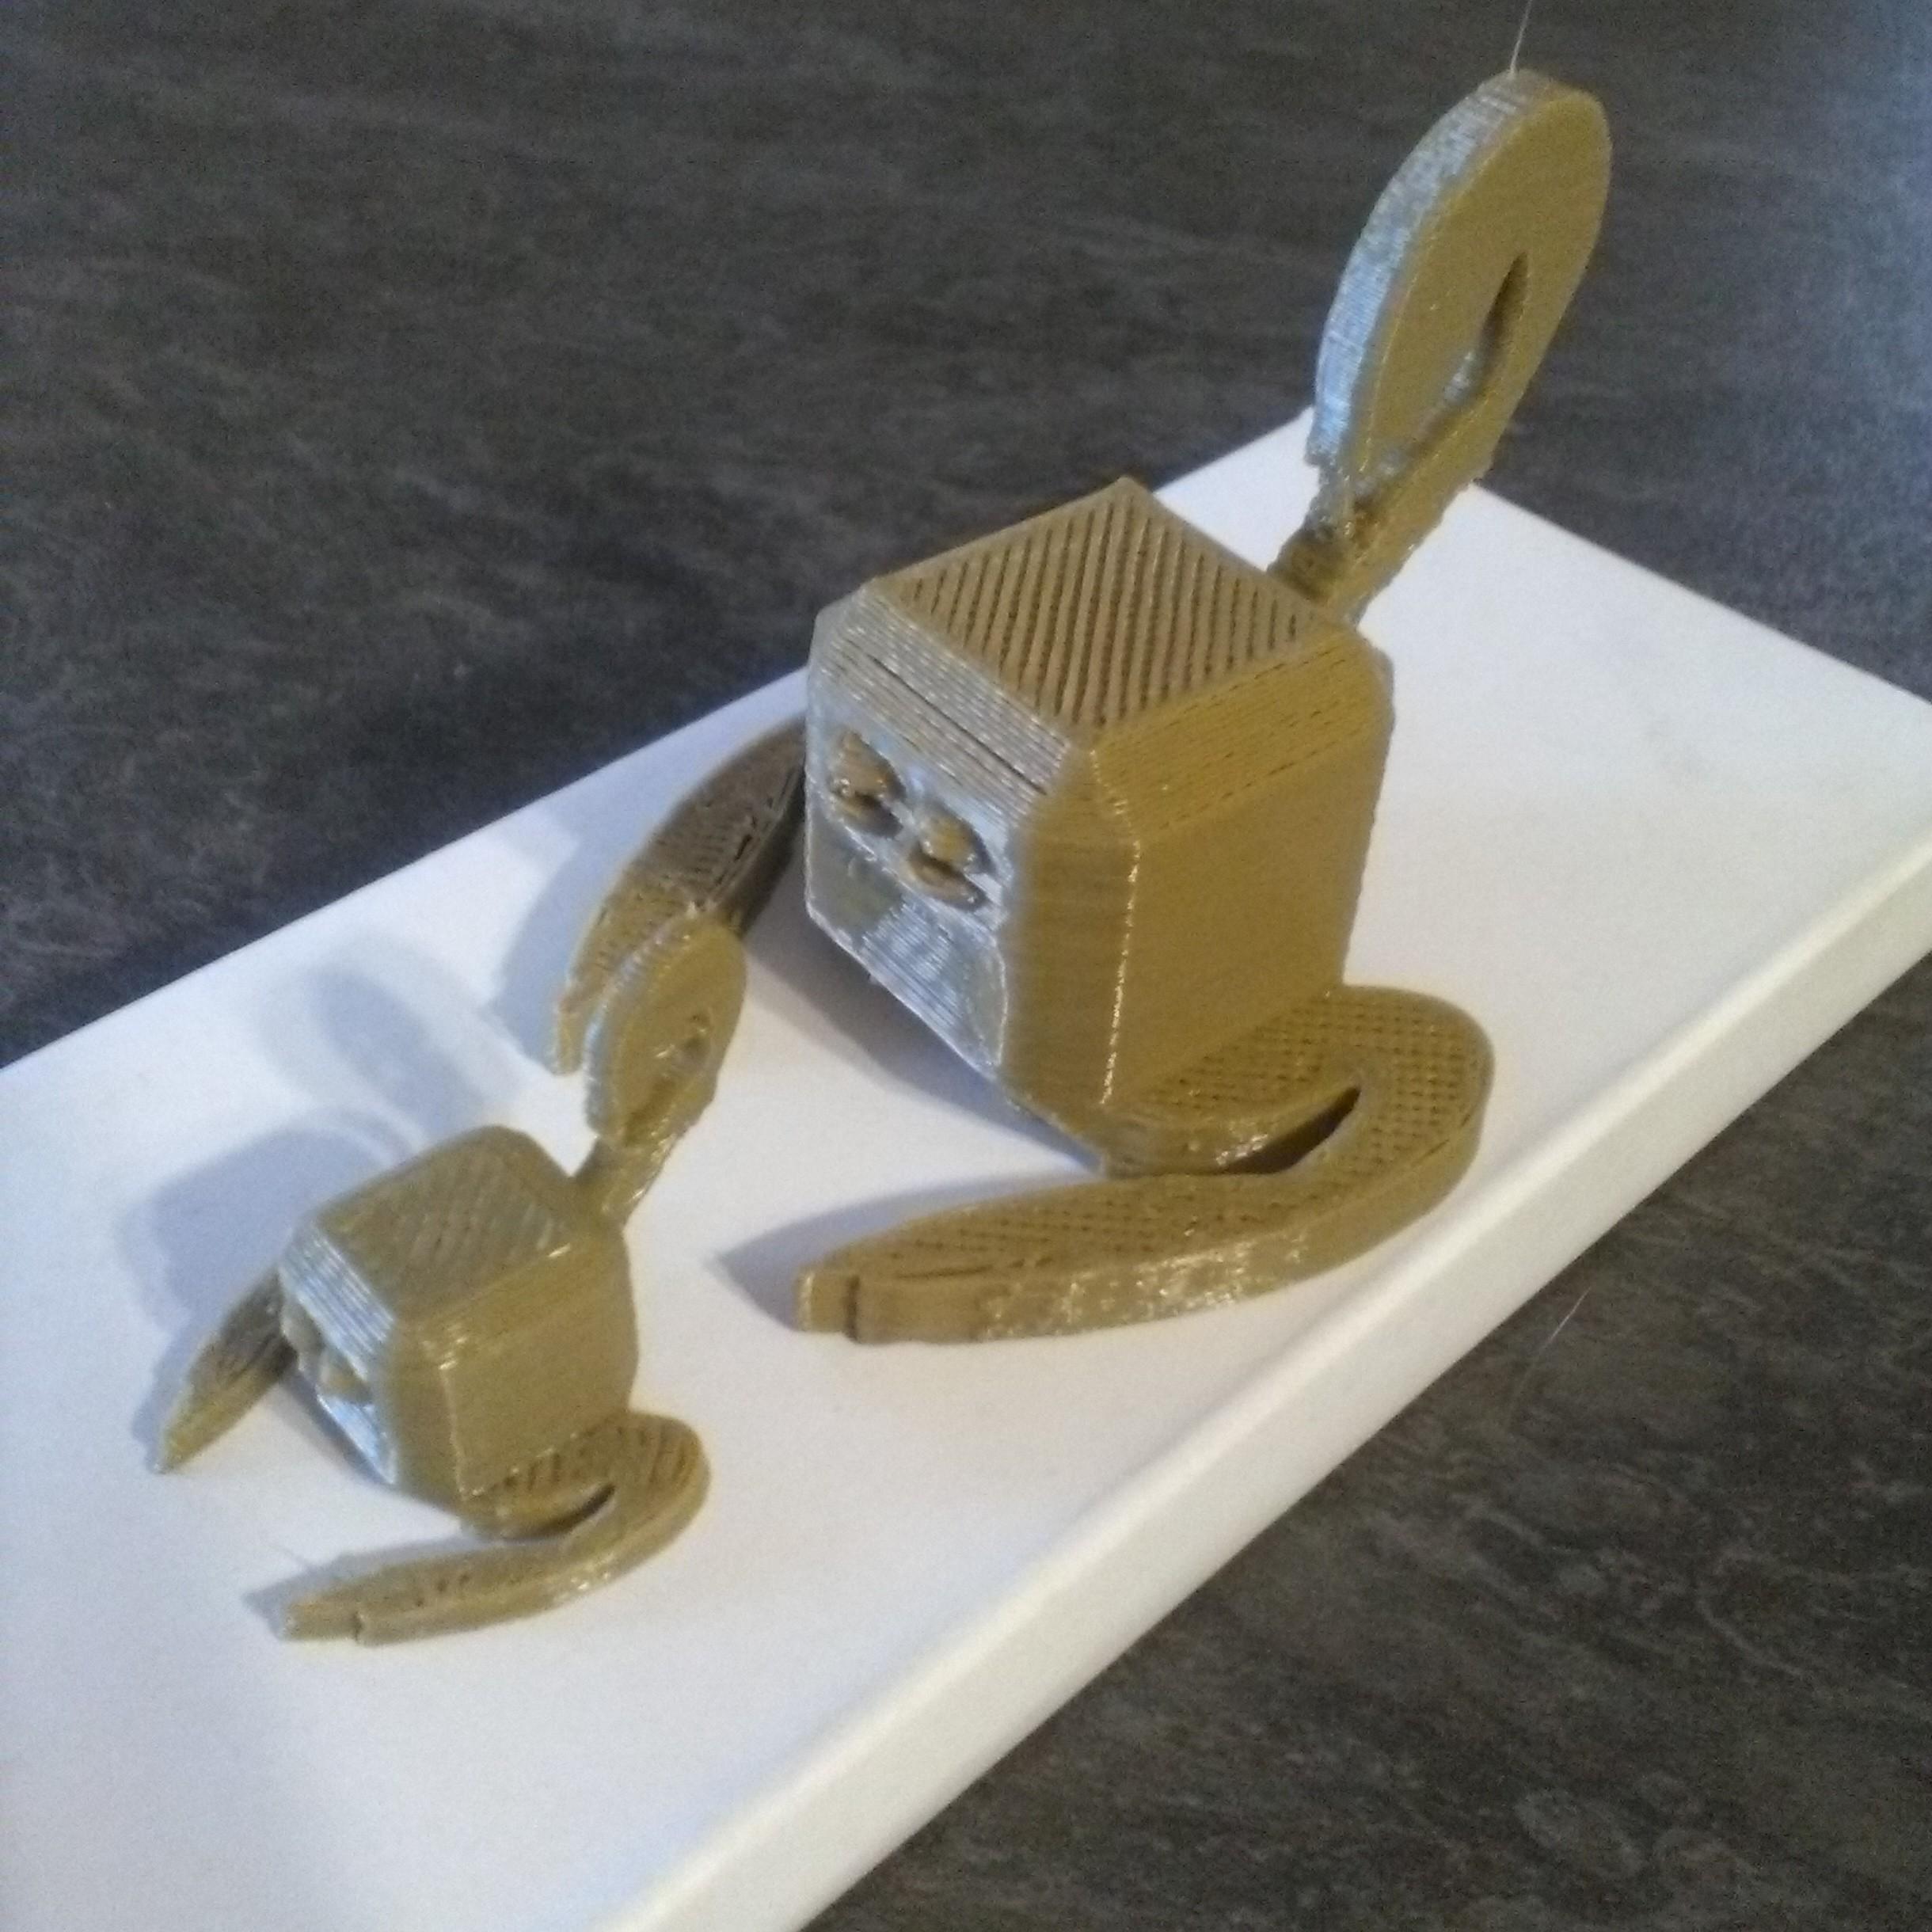 Mascottes_stratomaker.jpg Download free STL file Mascot stratomaker contest • Model to 3D print, parizot